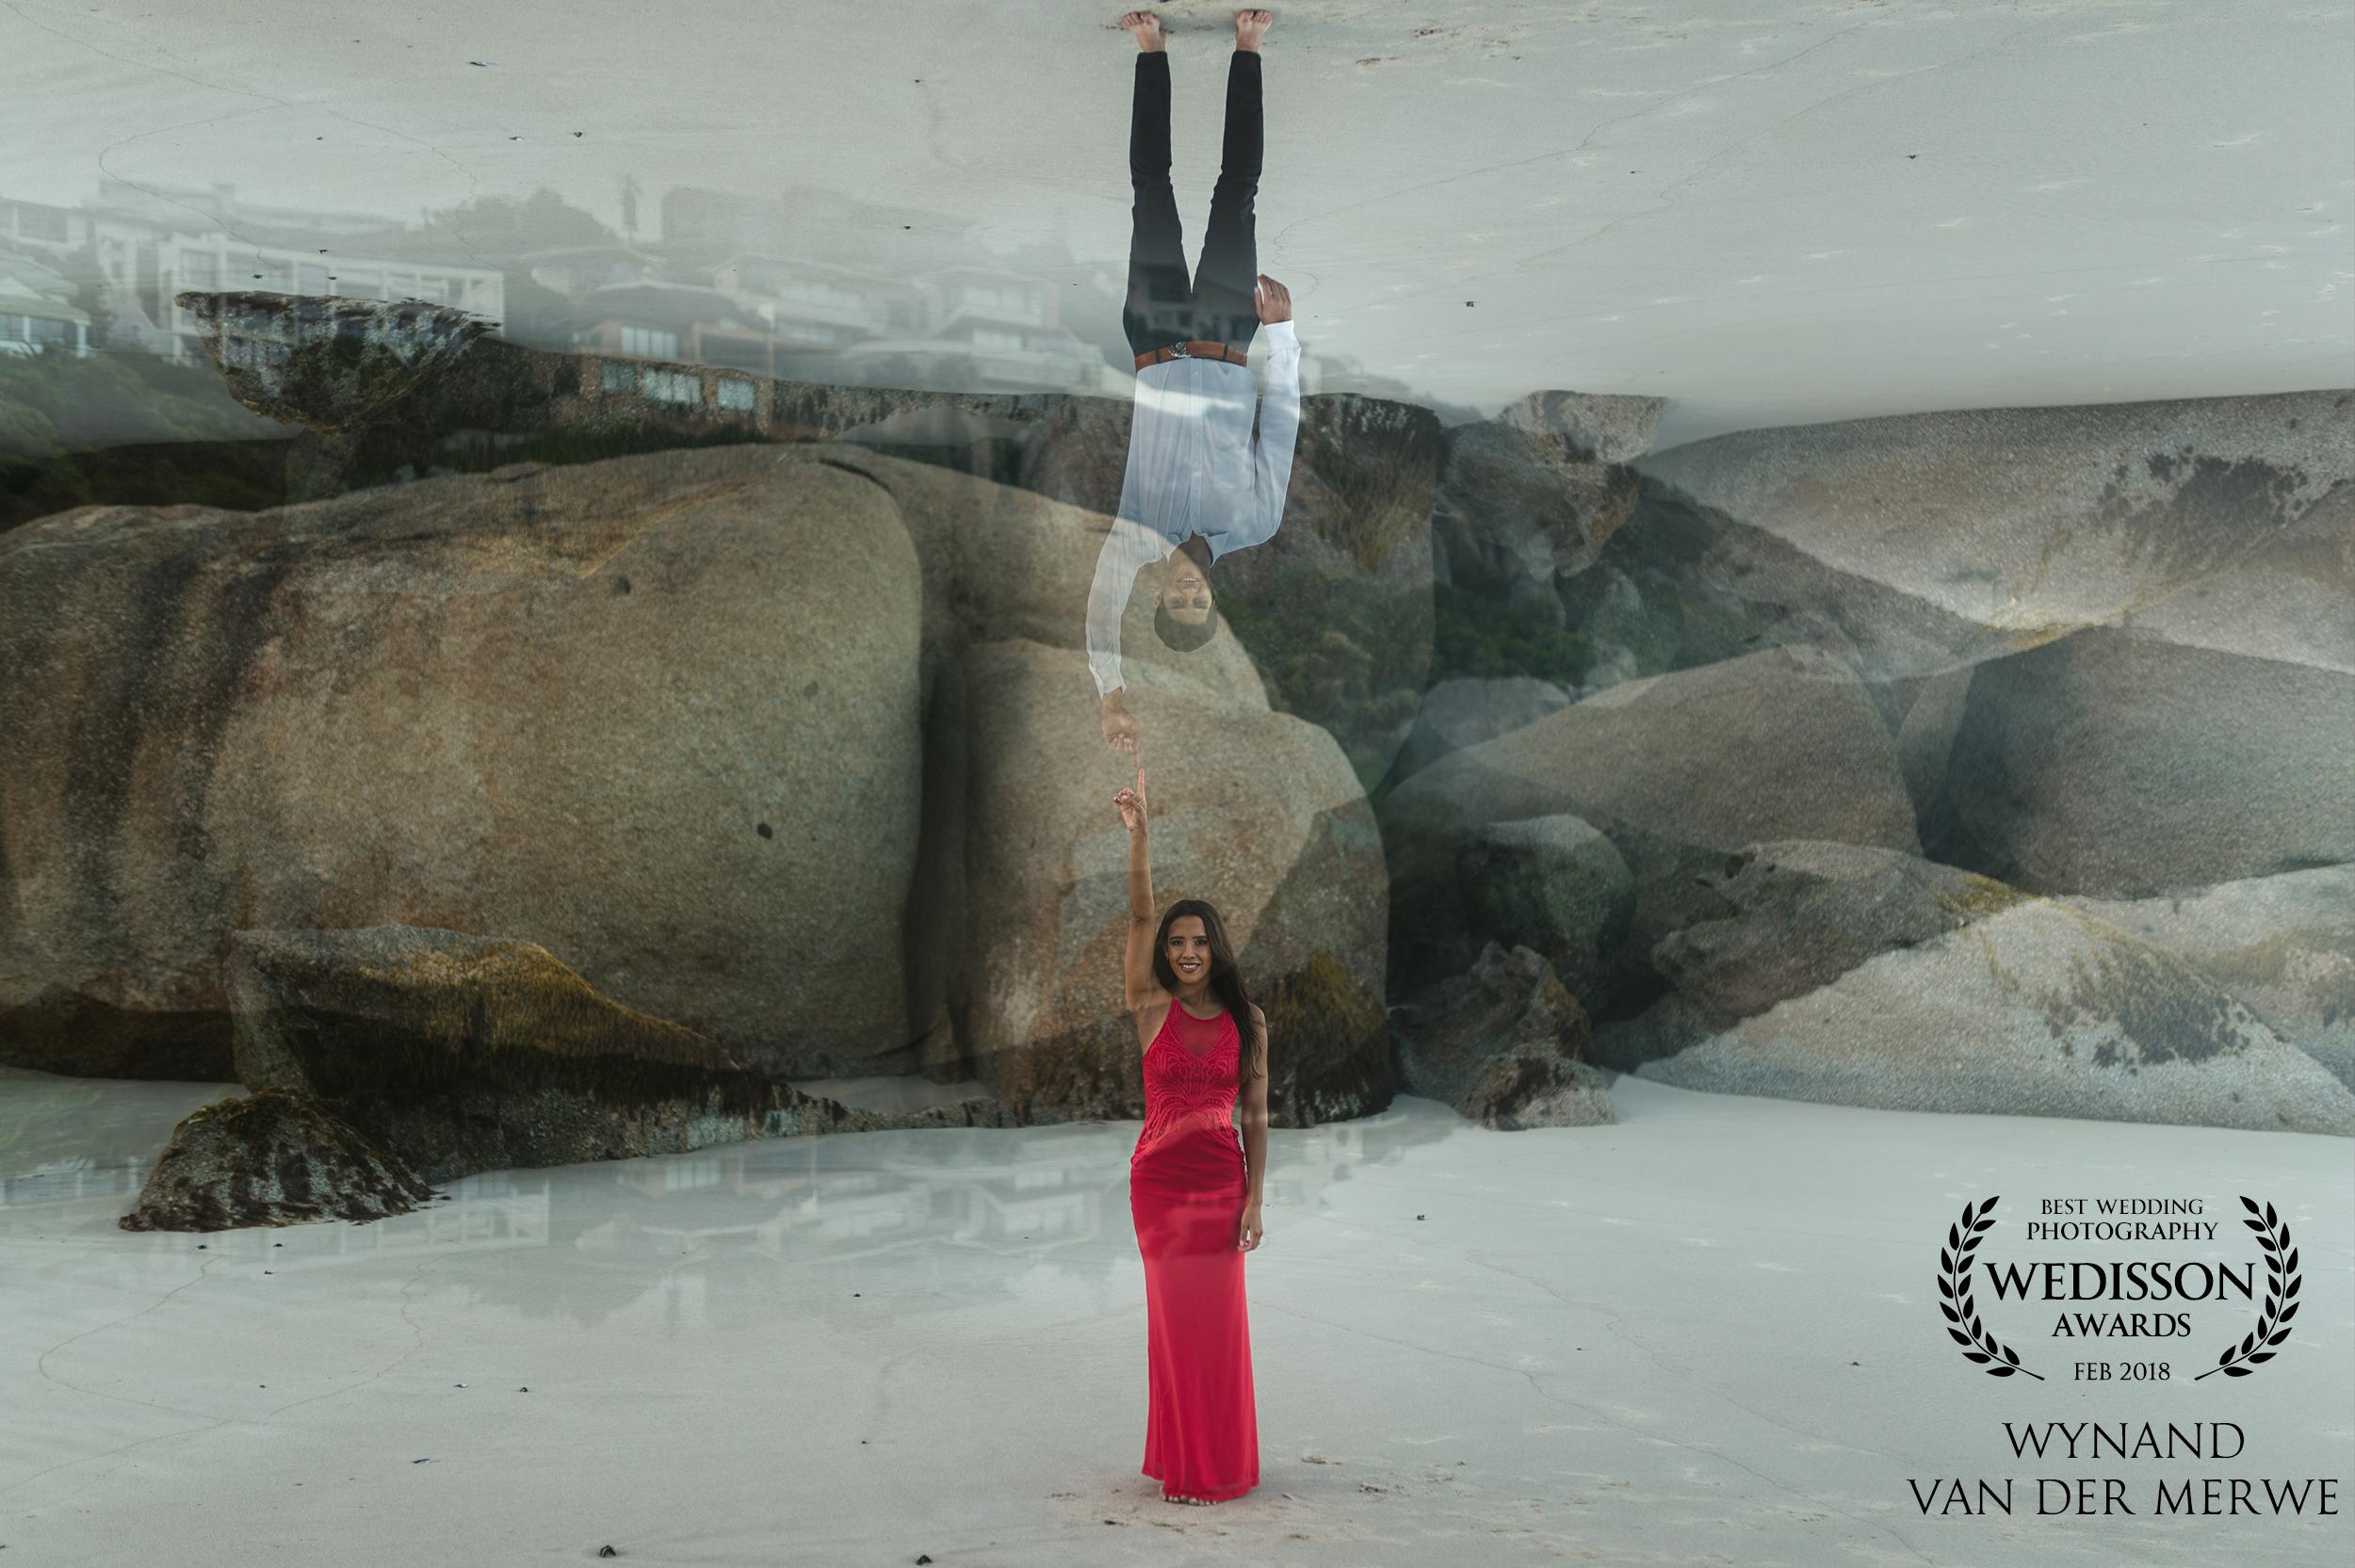 Nicolas & Greer's engagement shoot at Llandudno Beach, South Africa. #doubeexposure Wedisson Awards